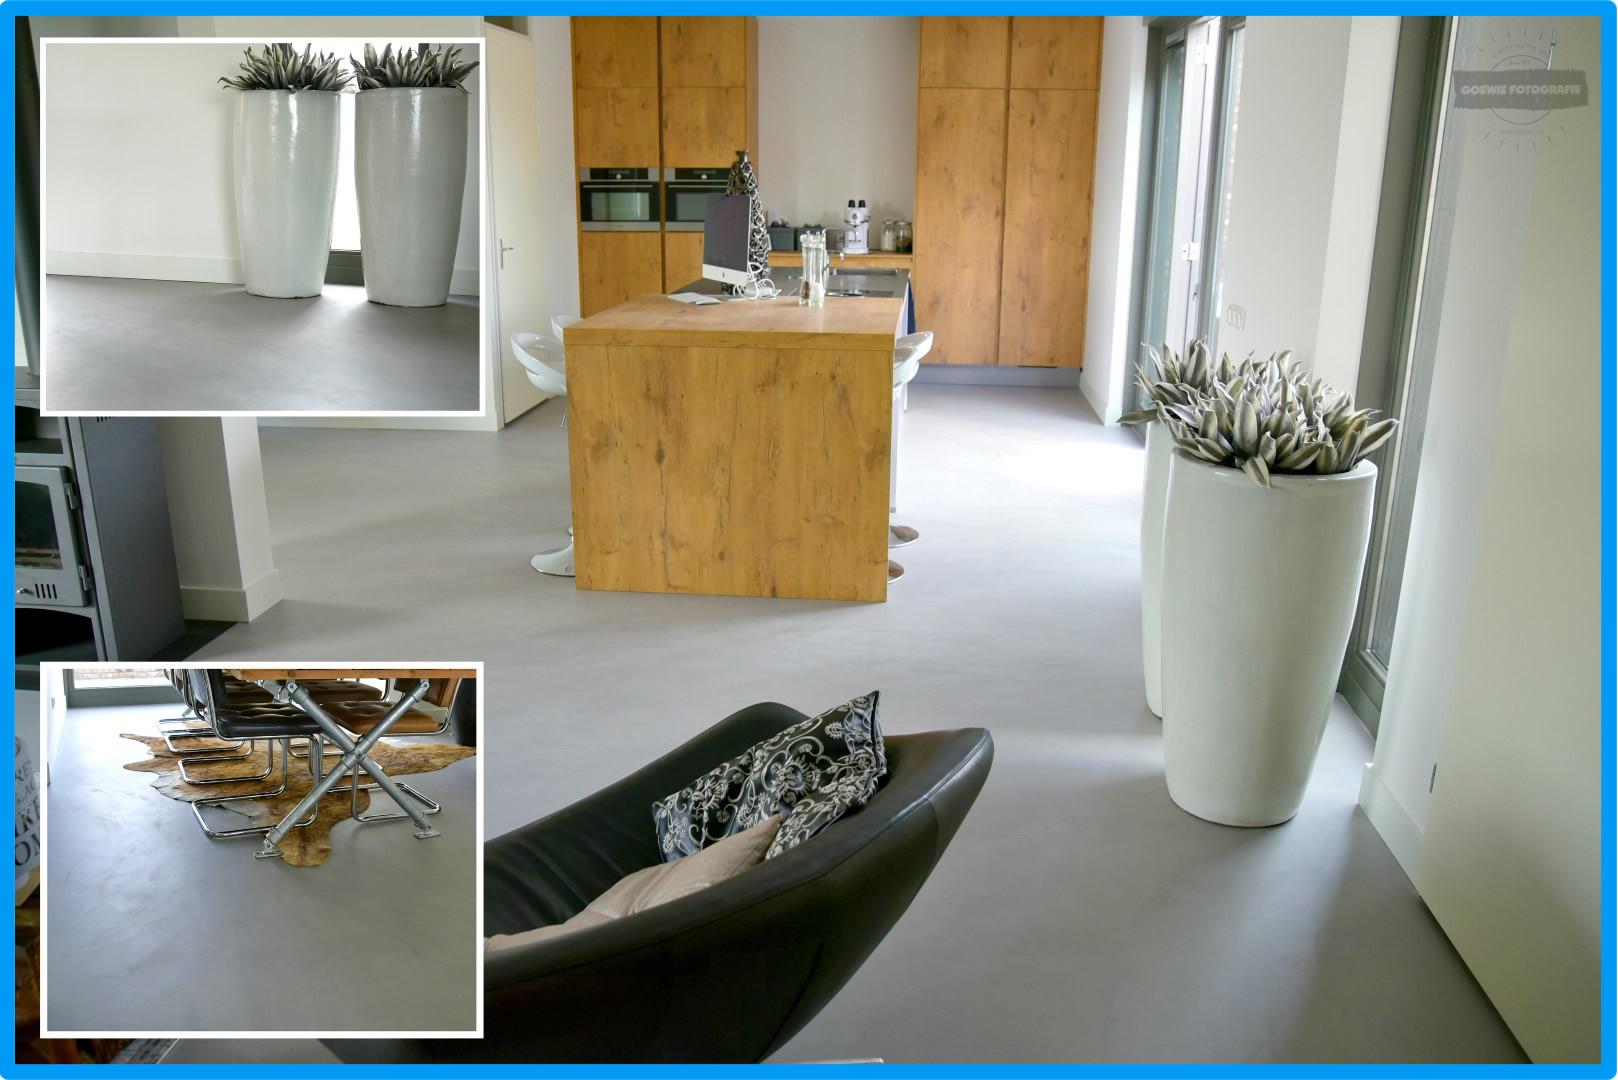 Design Betonvloer Prijs : Betonvloer prijzen betonvloer polijsten thomas gaspersz design